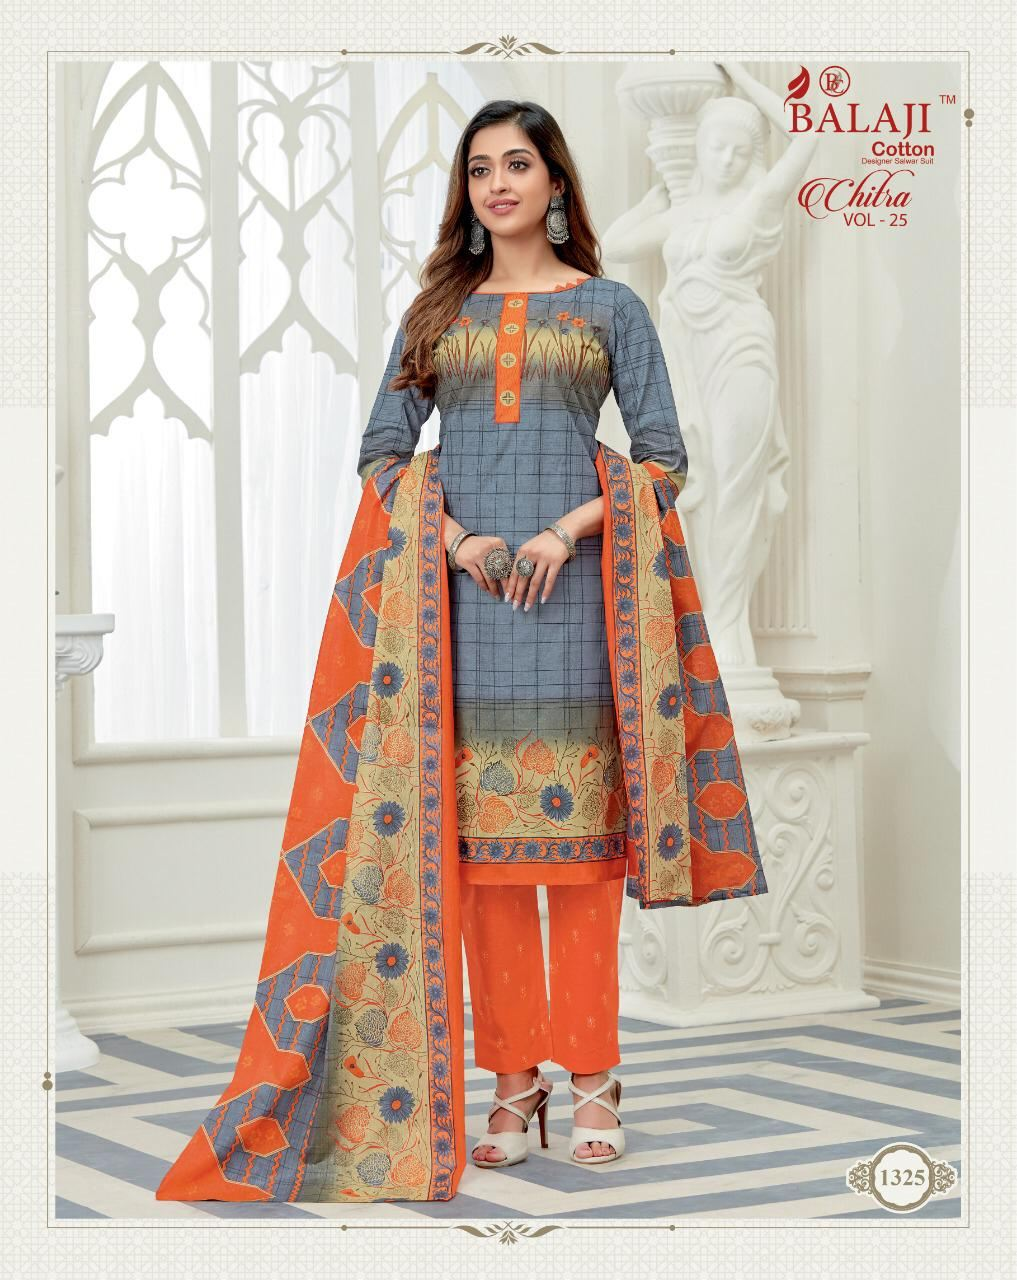 Balaji-Chitra-Vol-25-29